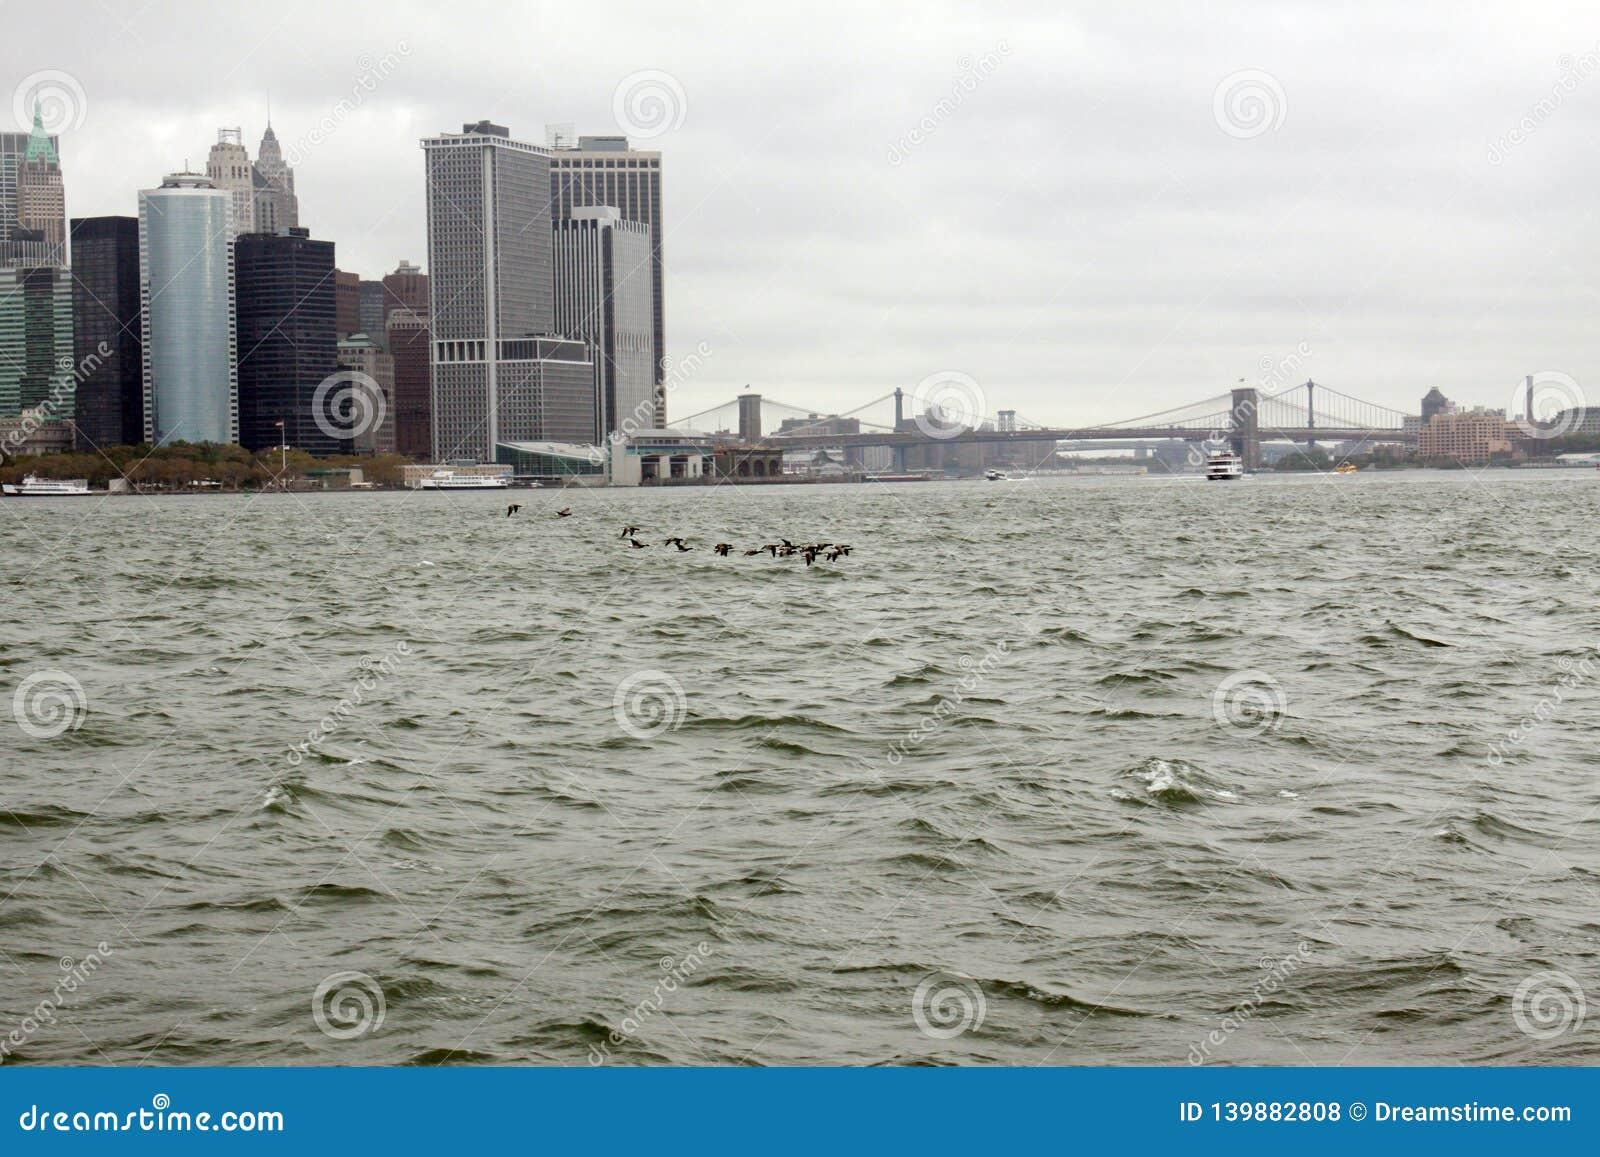 Enten auf dem East River